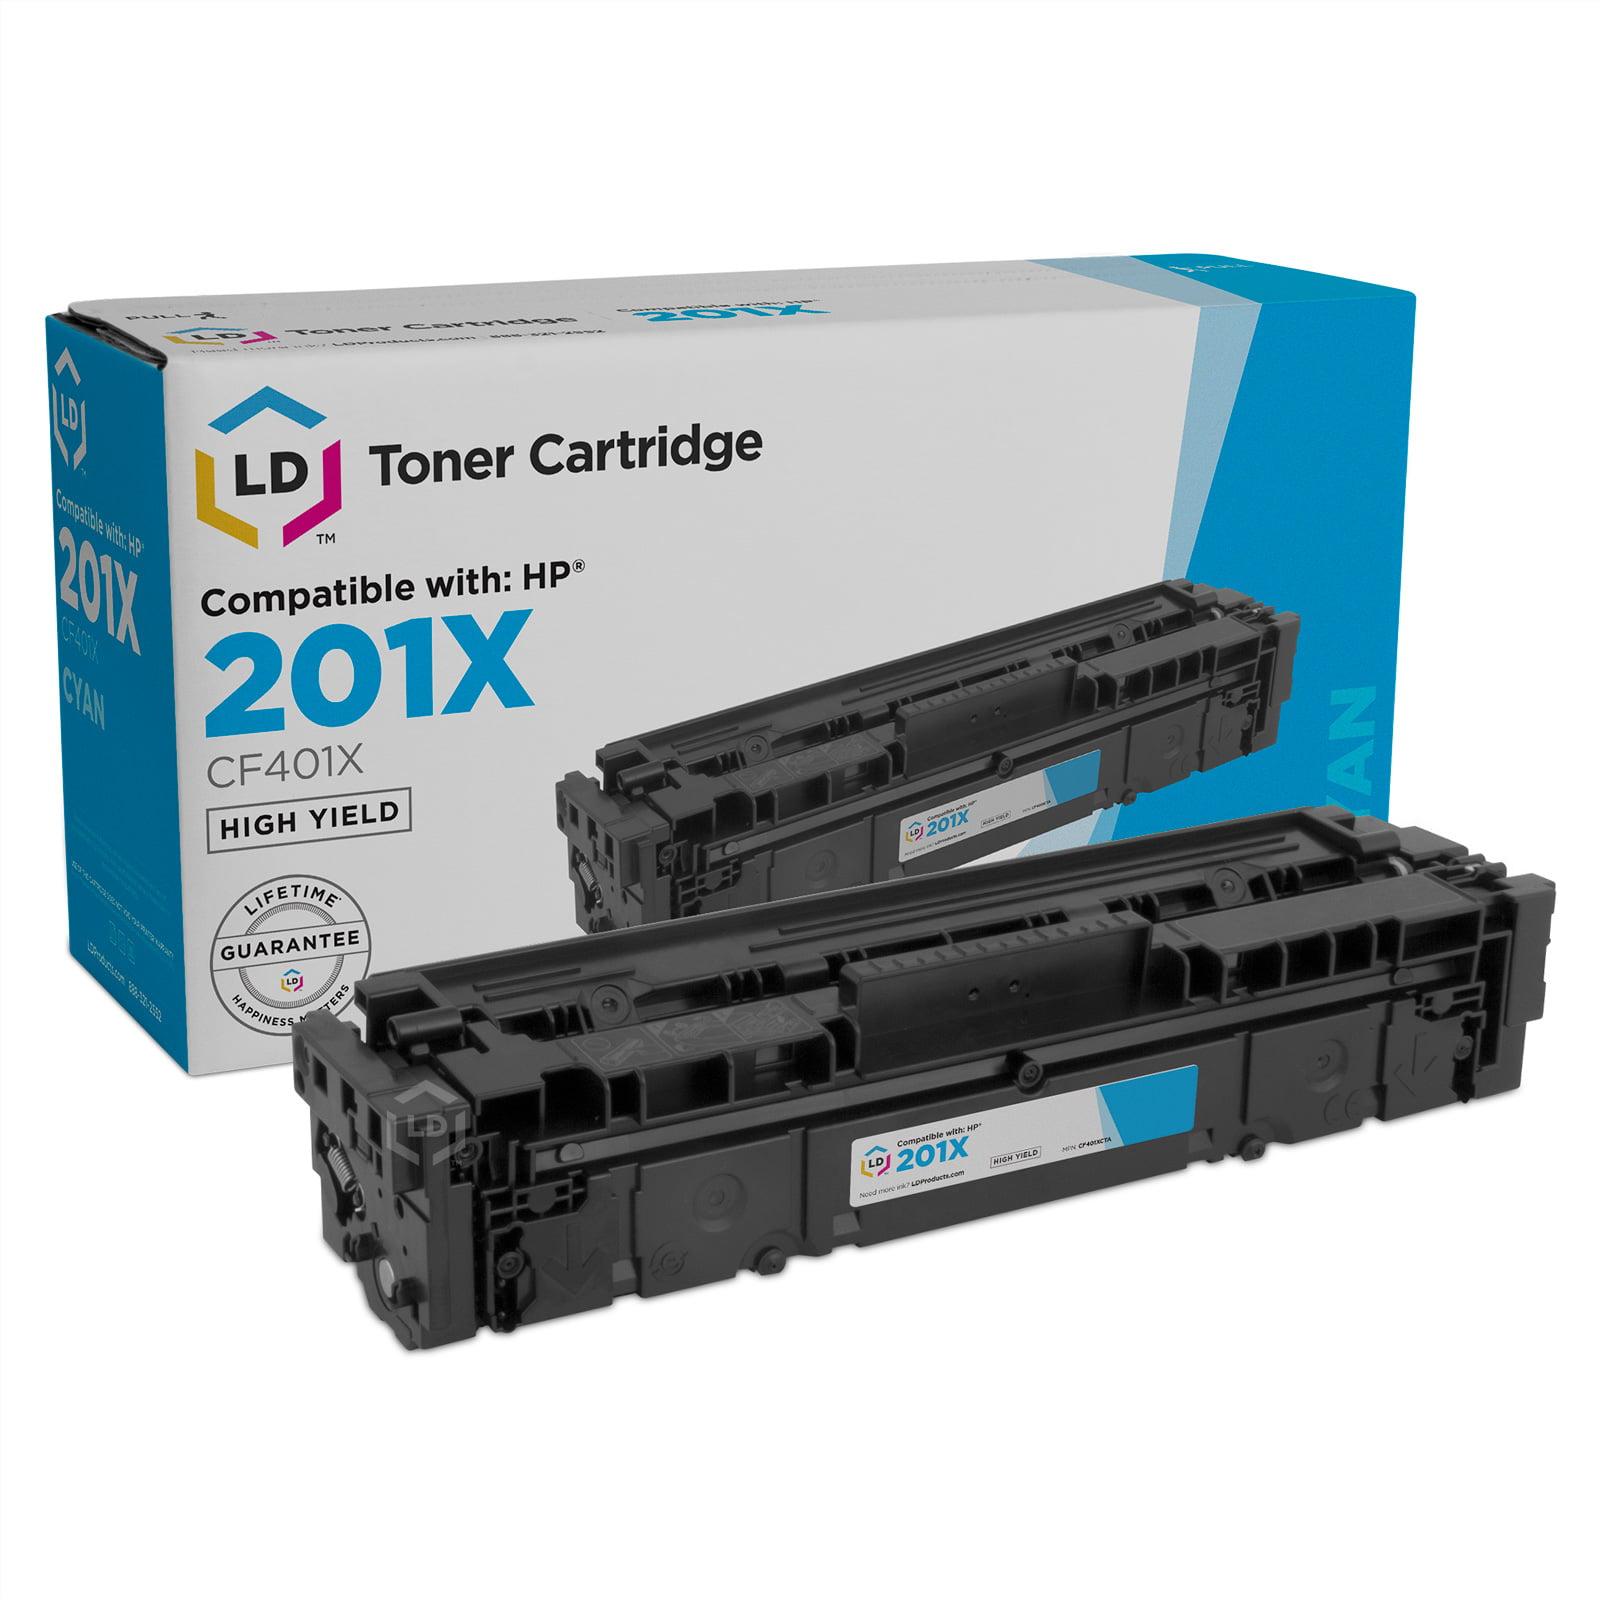 Compatible Toner Cartridge for HP 201X High Yield Cyan, 2,300 Page Yield (CF401X)